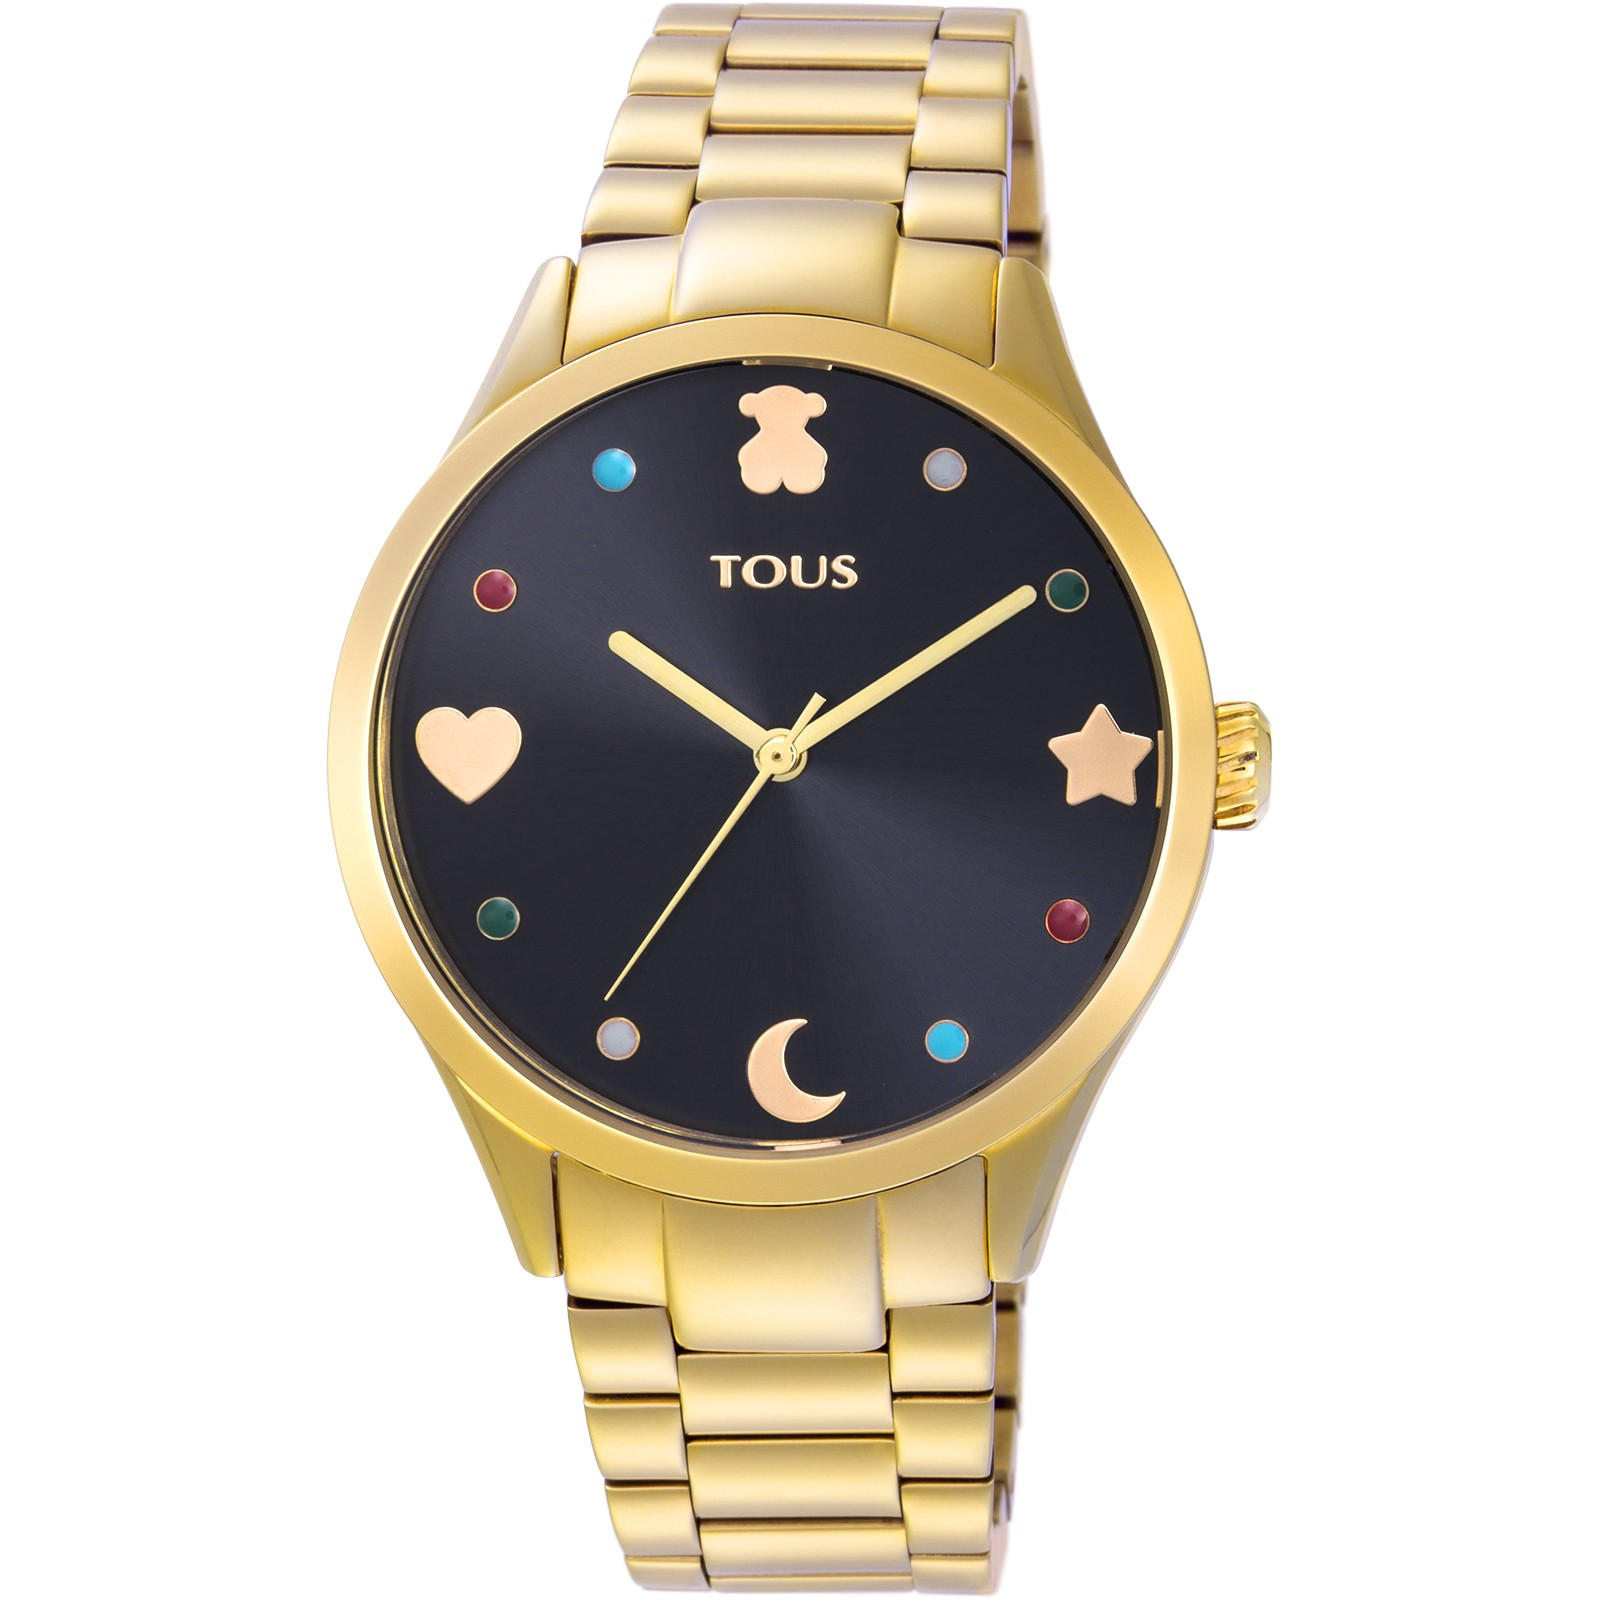 Reloj Super Power Negro-Dorado Tous TTSPS - TDT